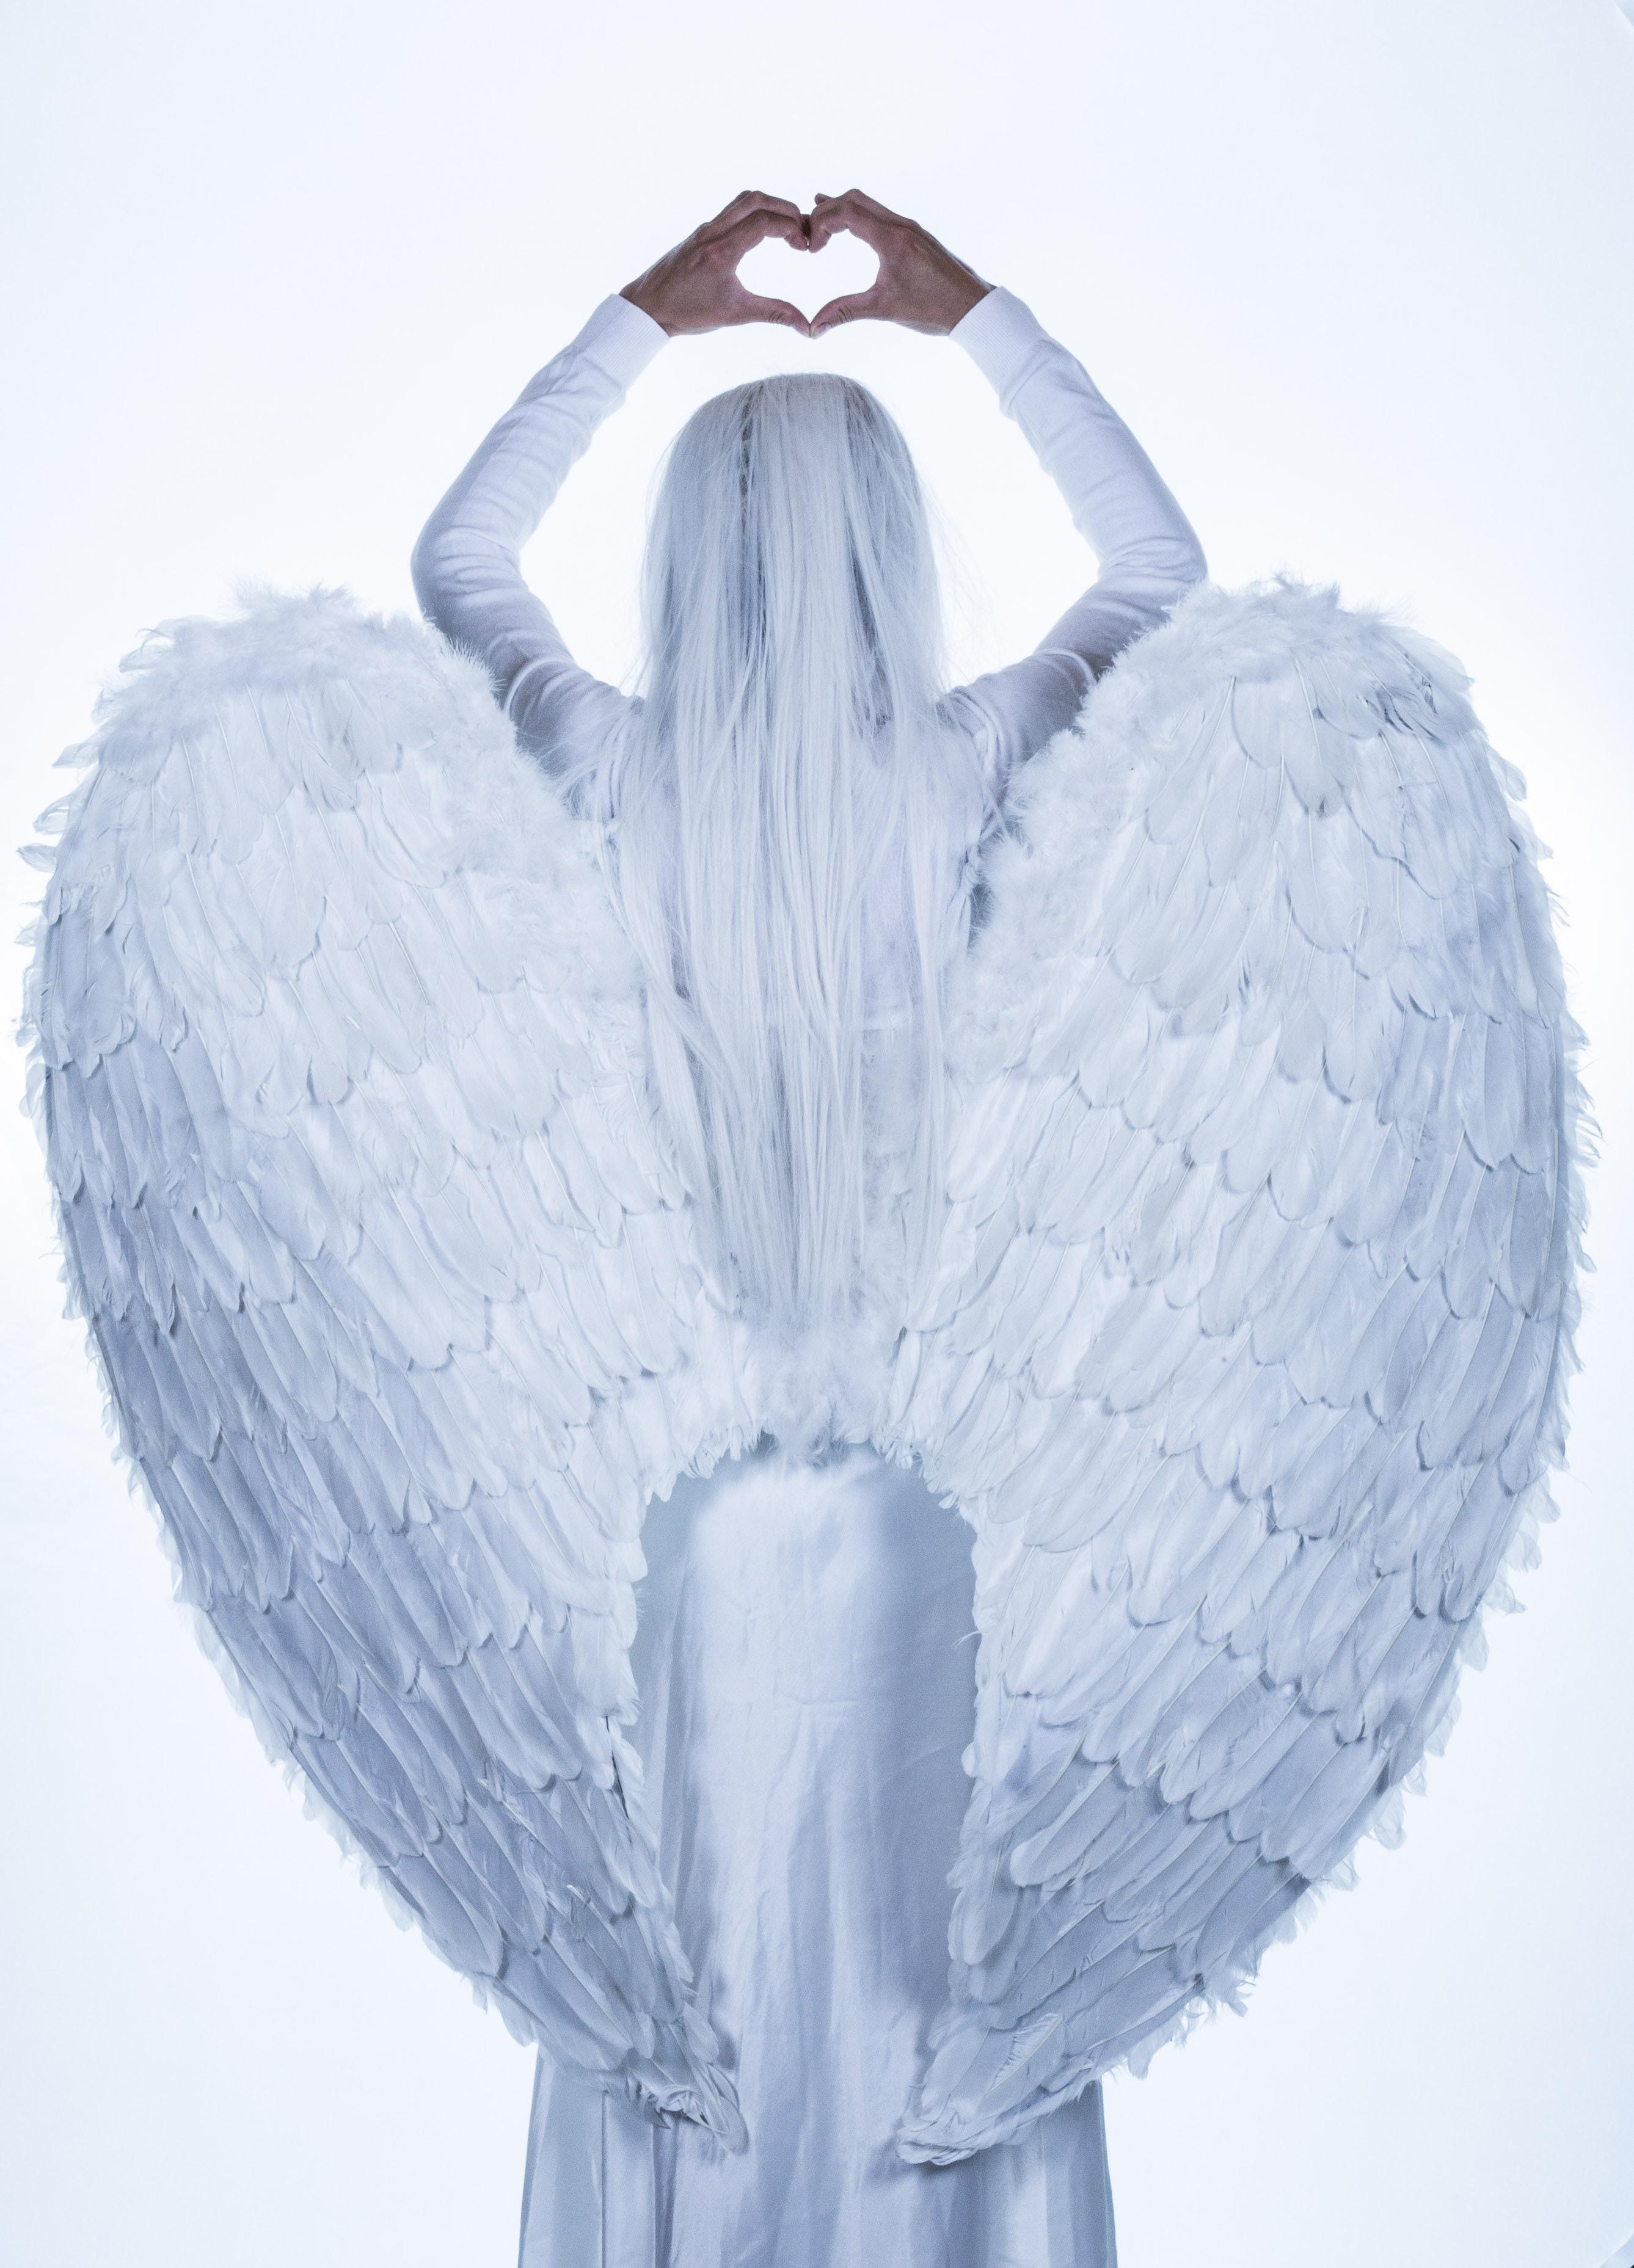 White Angel Illustration, Angel, Art, Costume, Facing away, HQ Photo